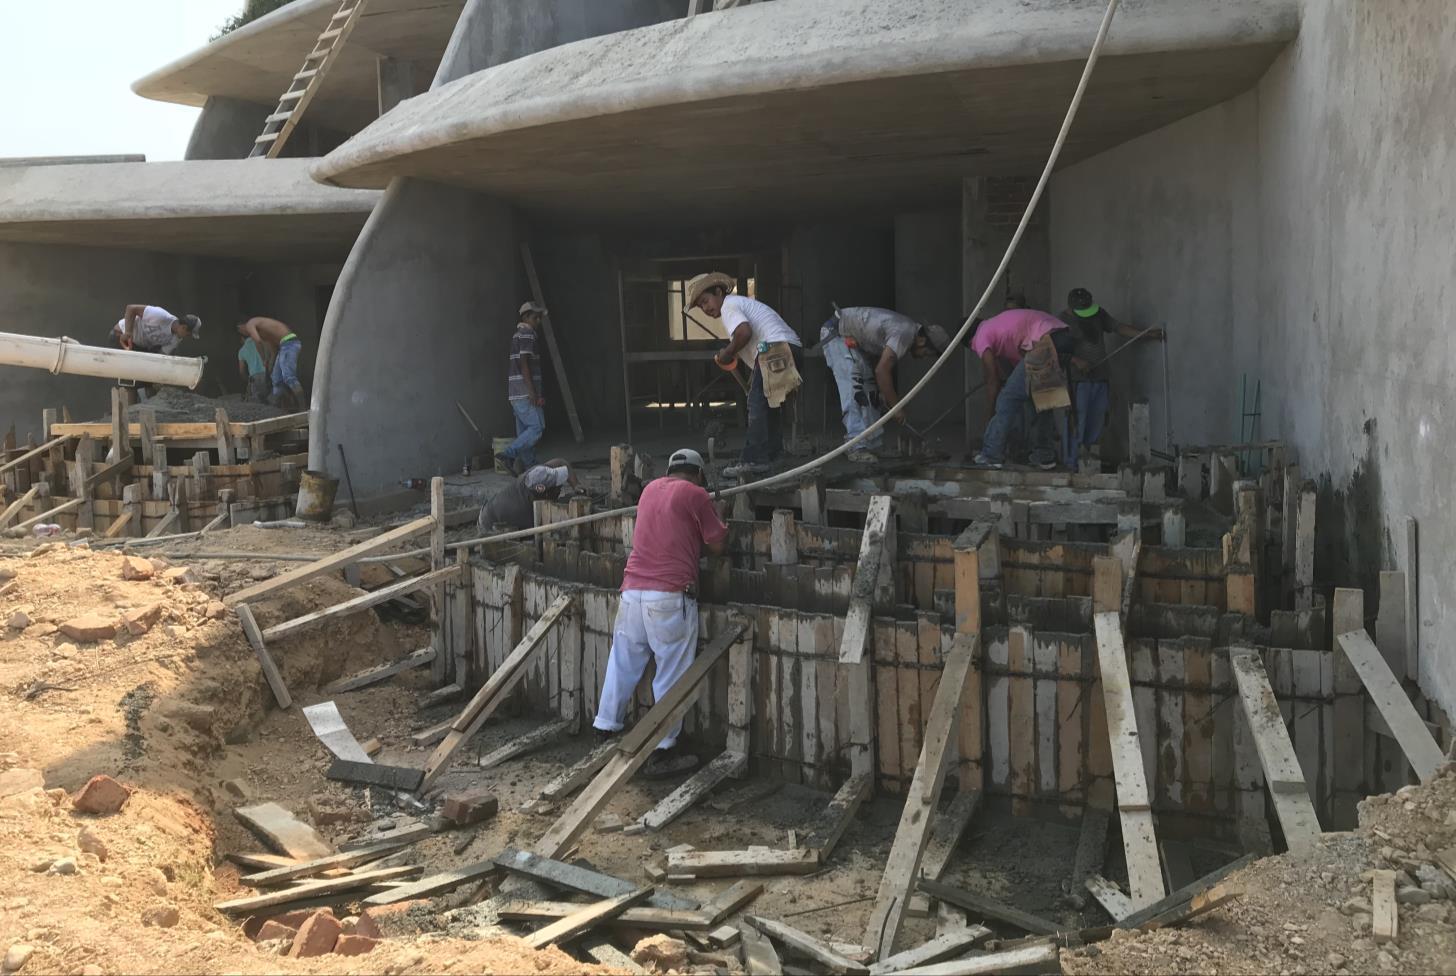 REPORTE-FOTOGRAFICO-PUNTA-MAJAHUA-27-DE-FEBRERO-DEL-2017-019.jpg